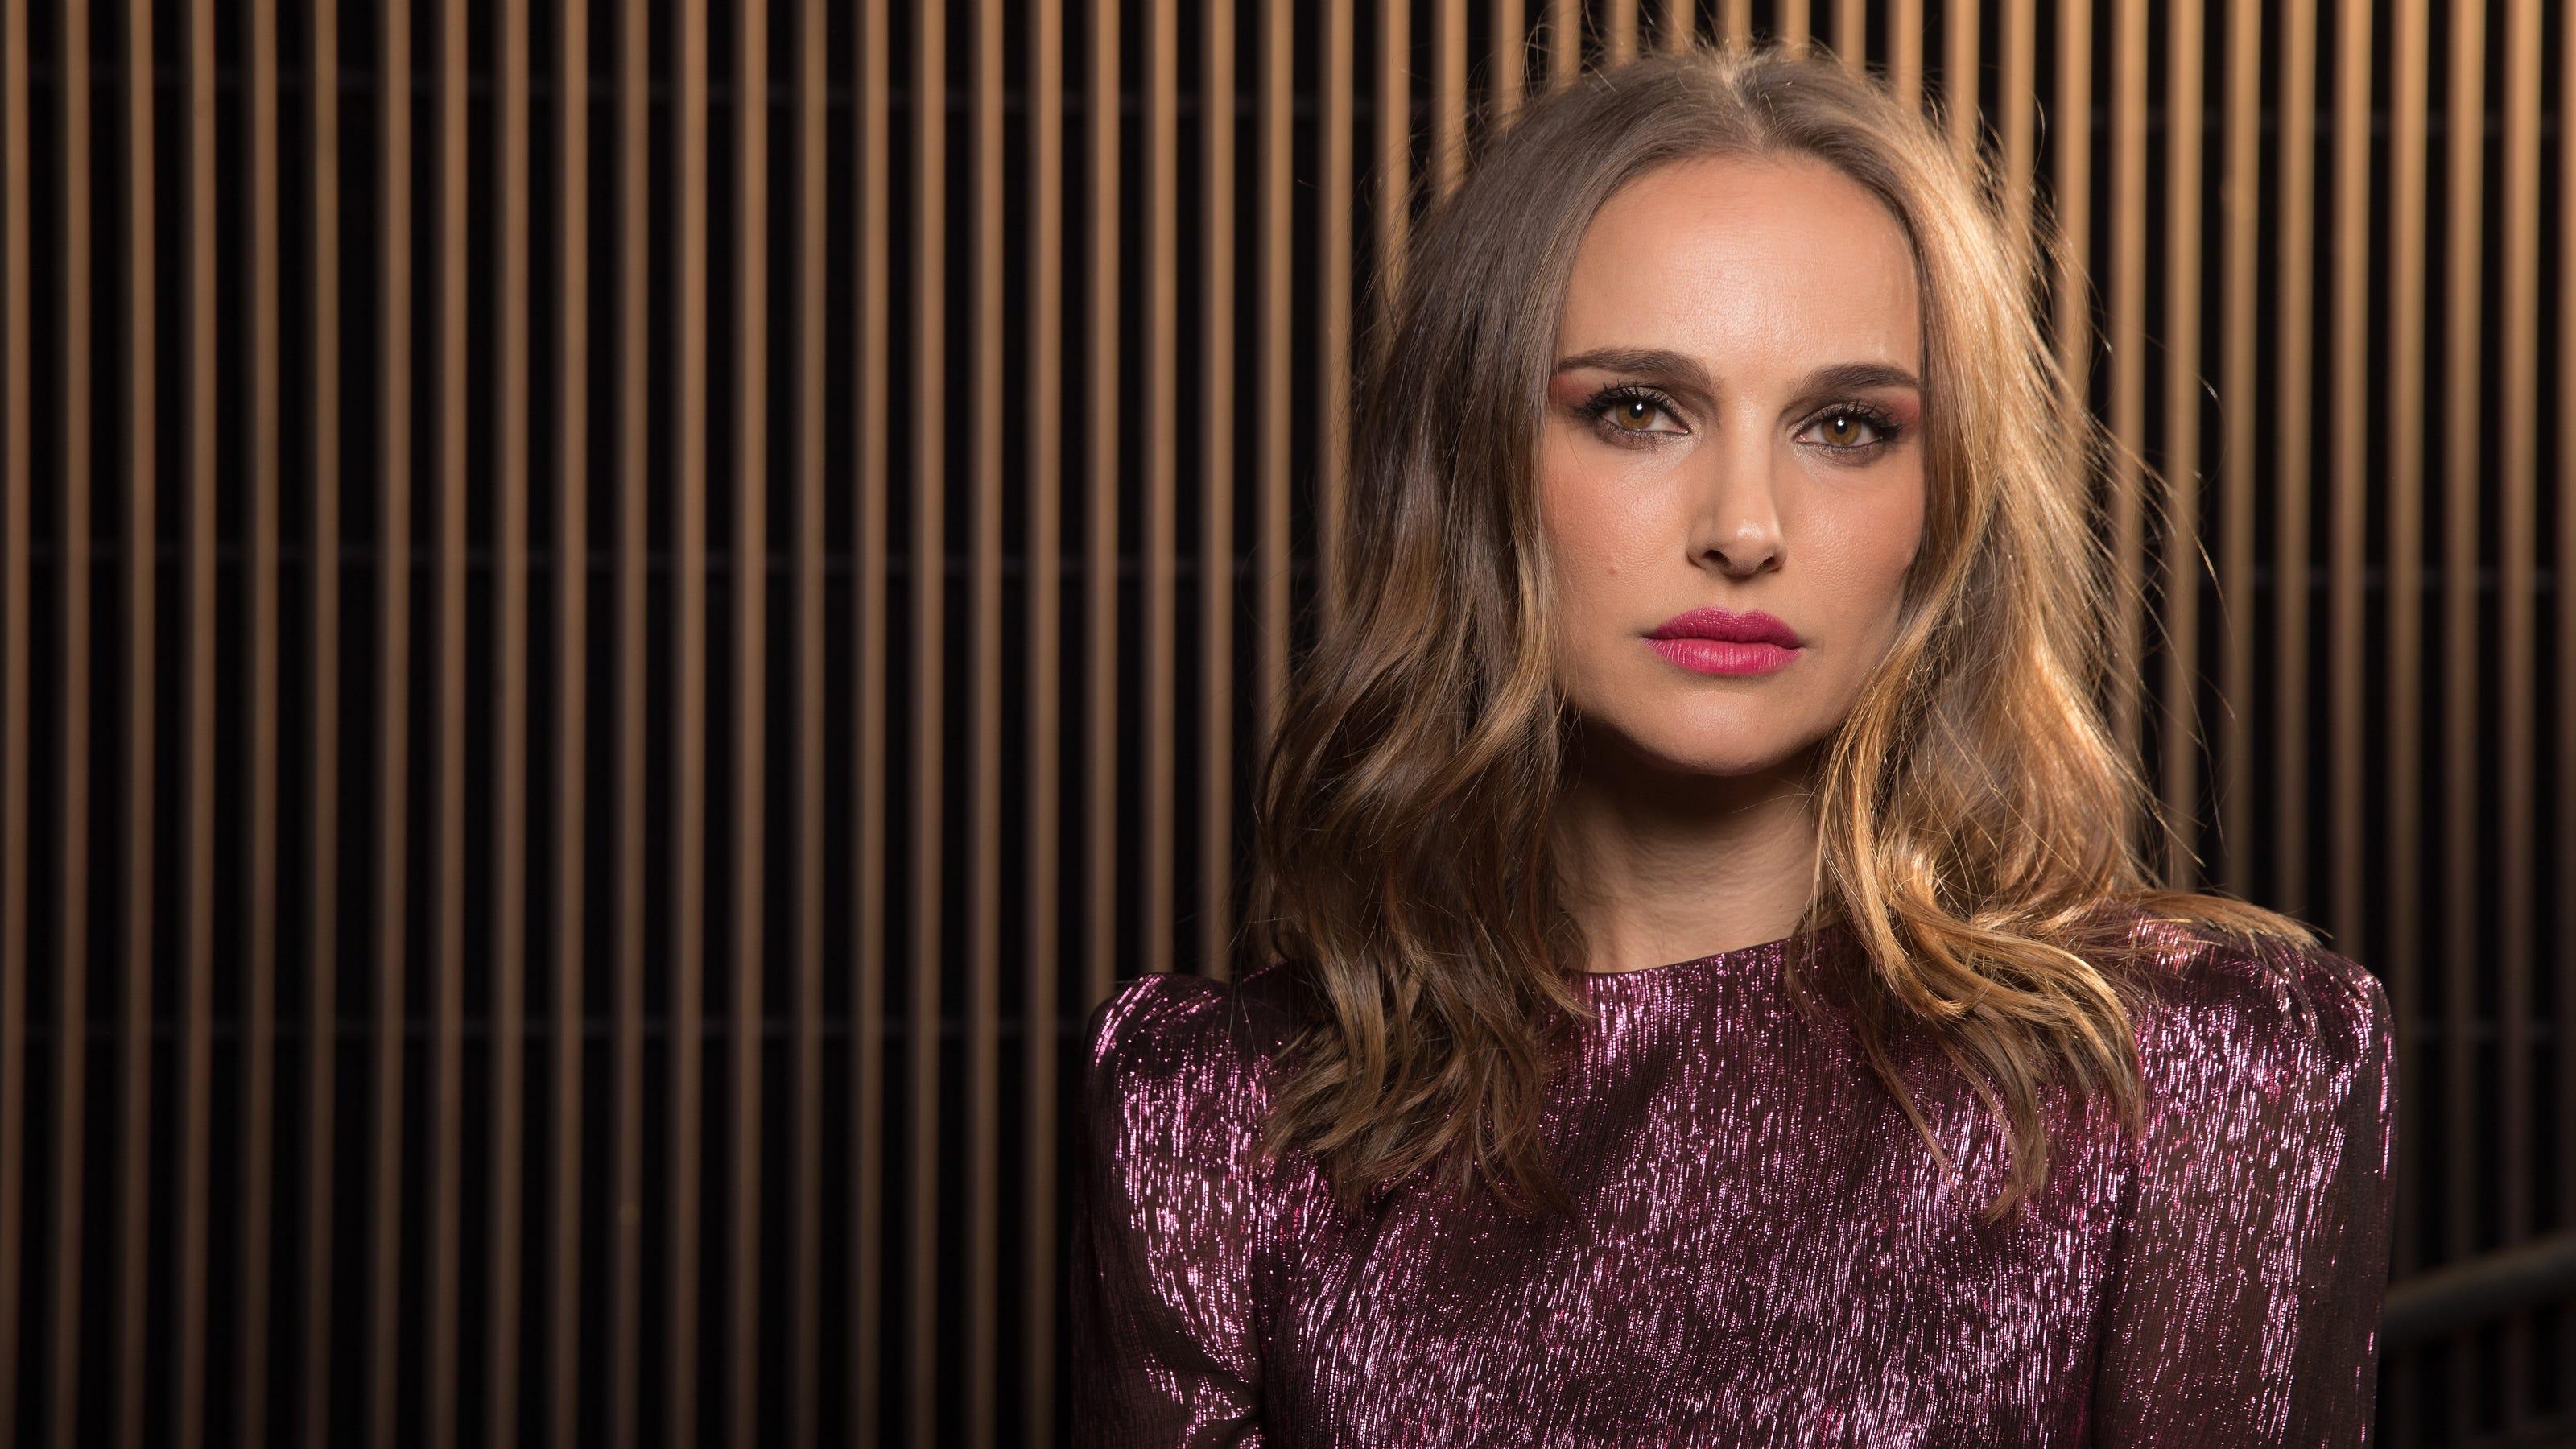 Natalie Portman's Complete Filmography